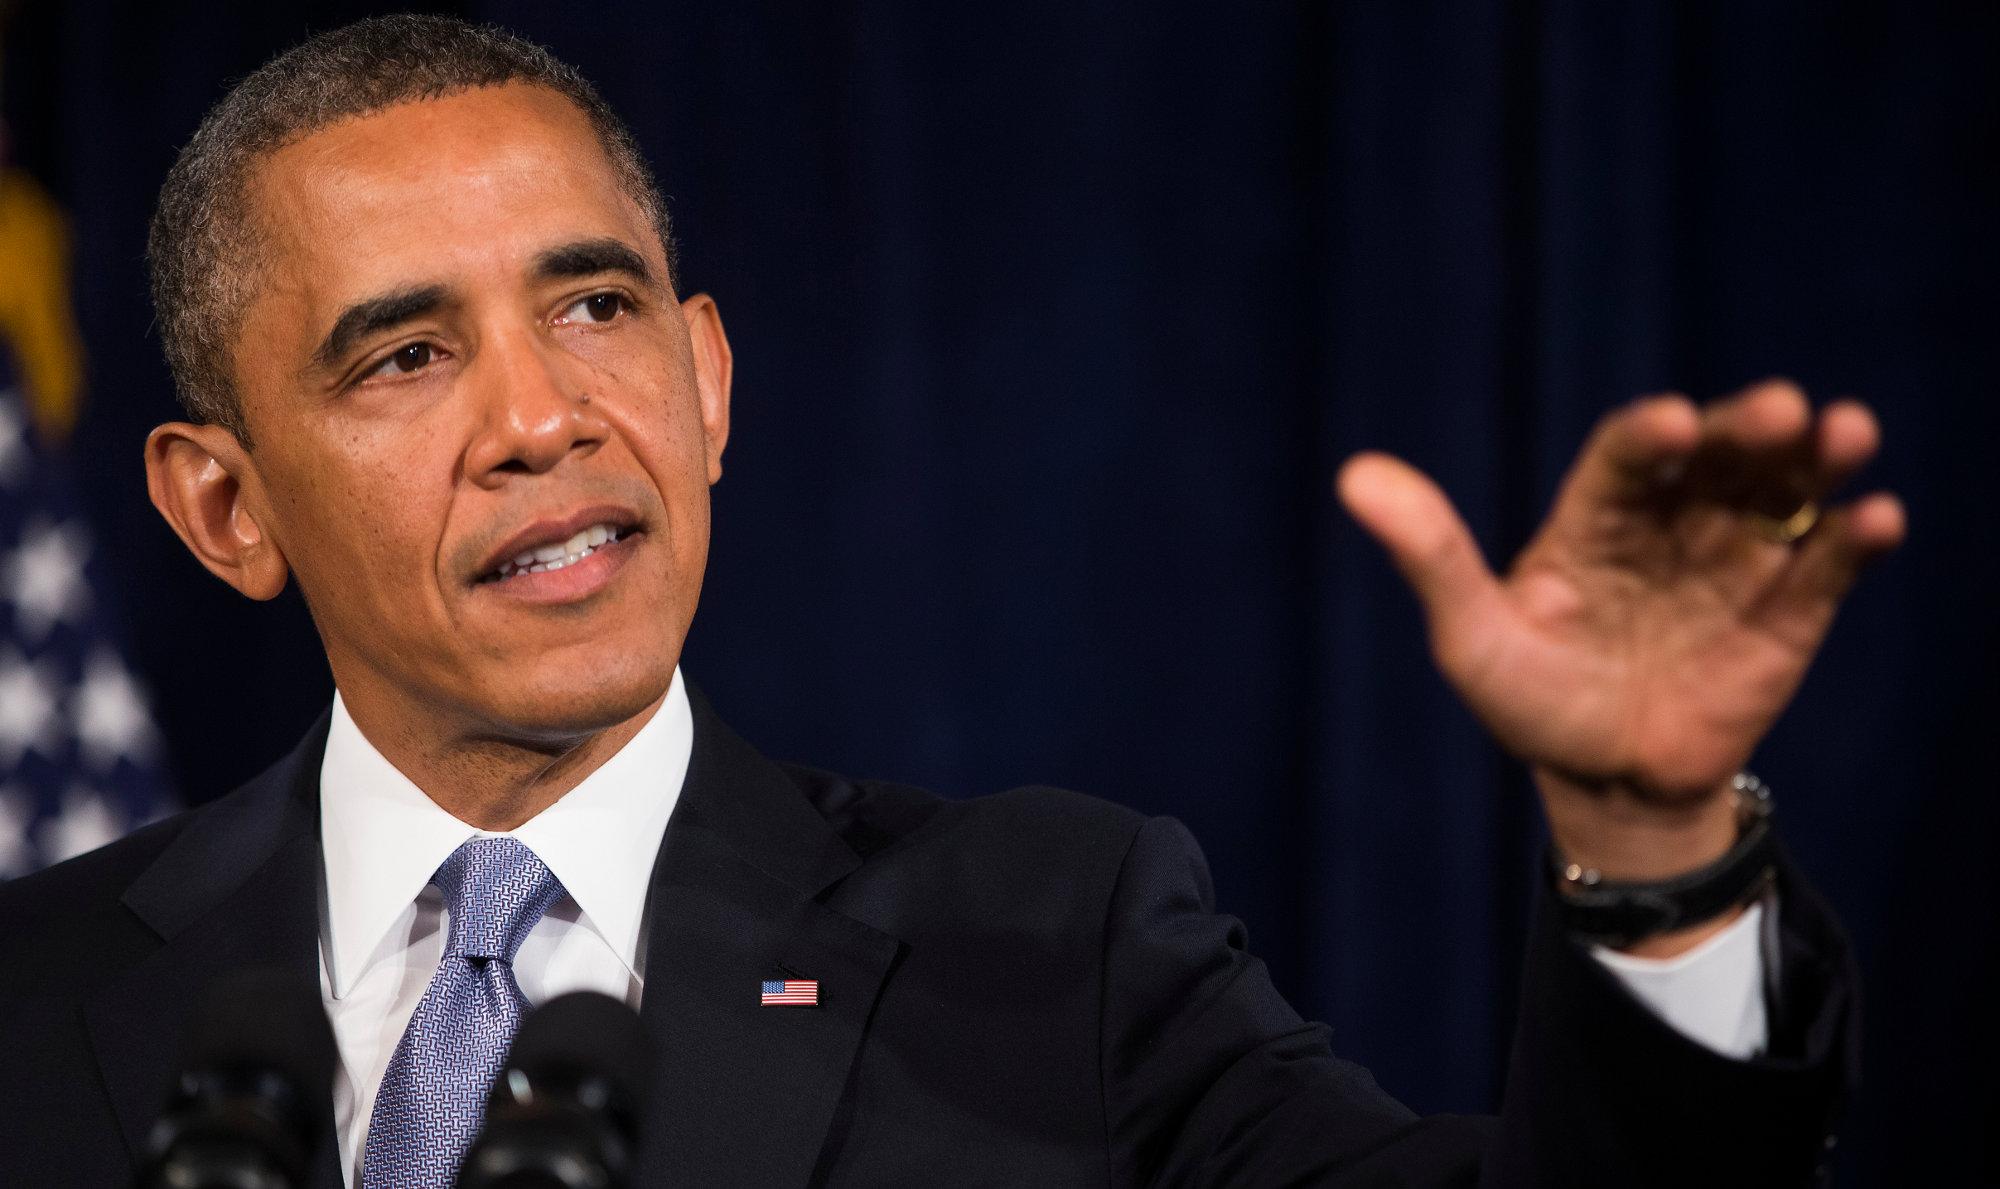 Barack Obama expresidente de EEUU